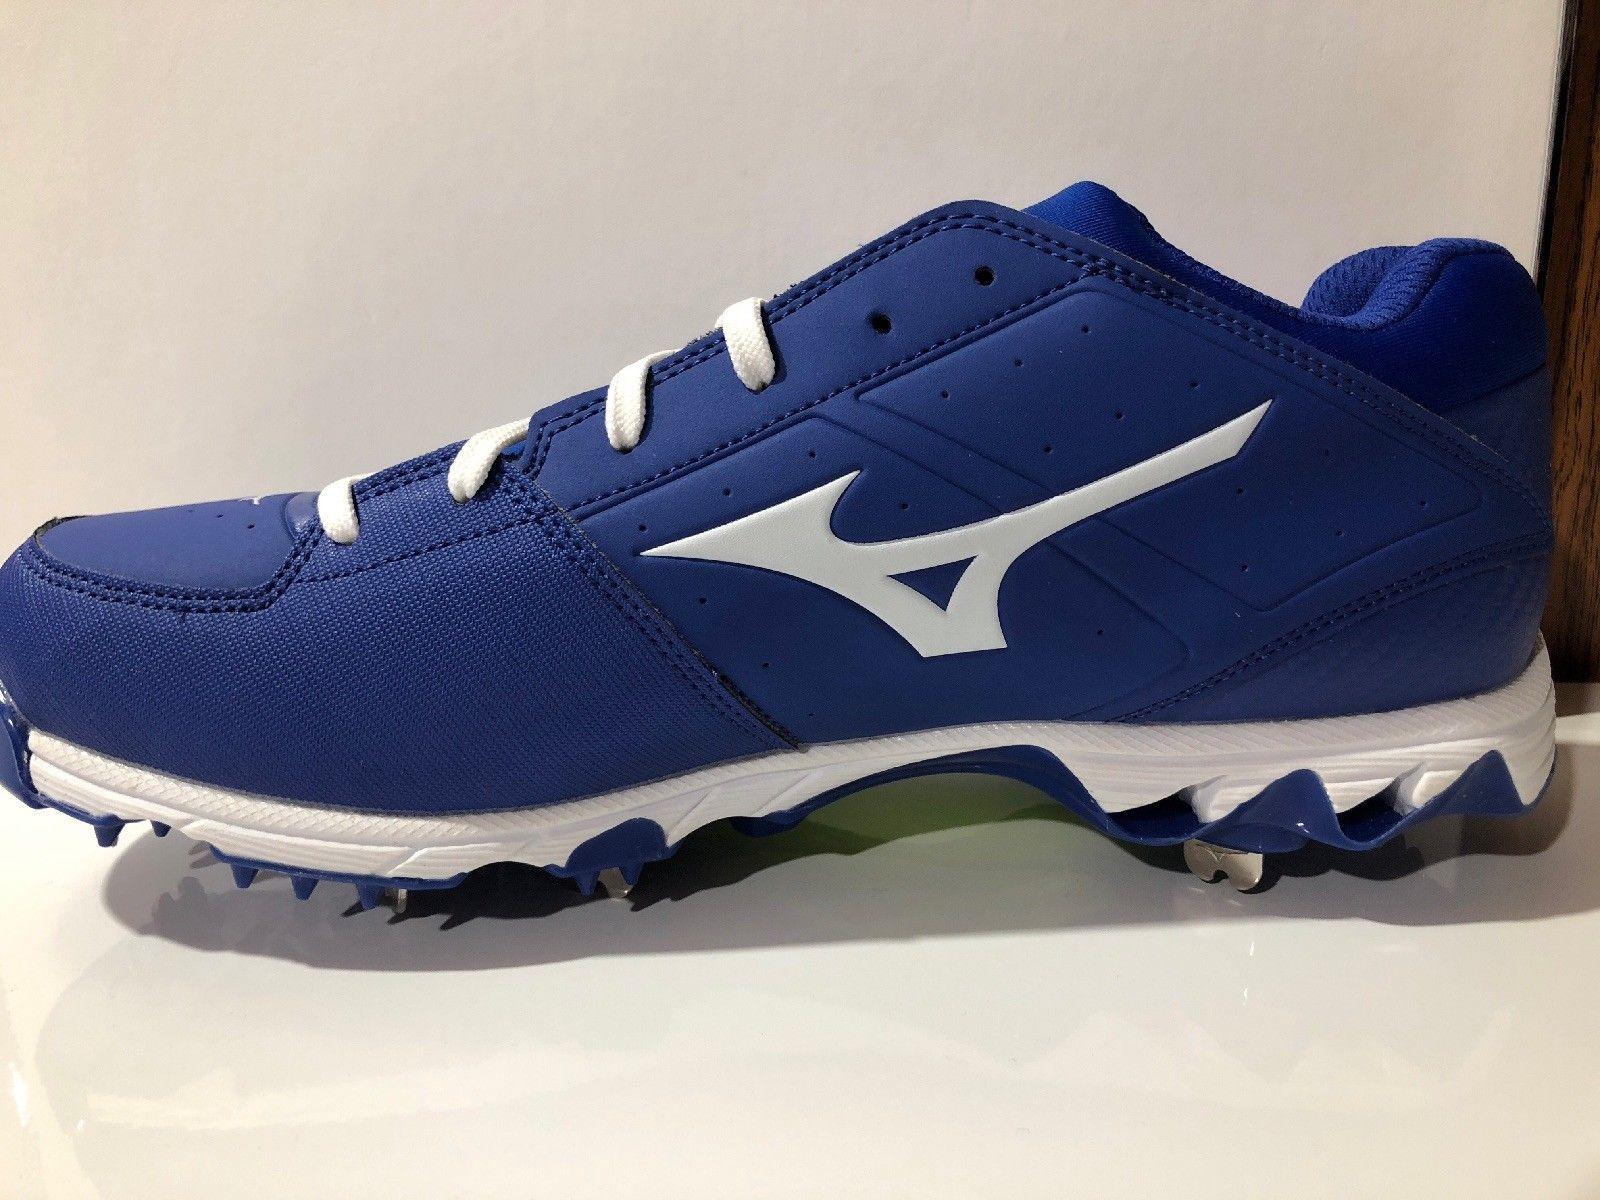 buy popular 3617c f7119 Womens Softball Cleats 11.5 Mizuno 9-Spike and 50 similar items